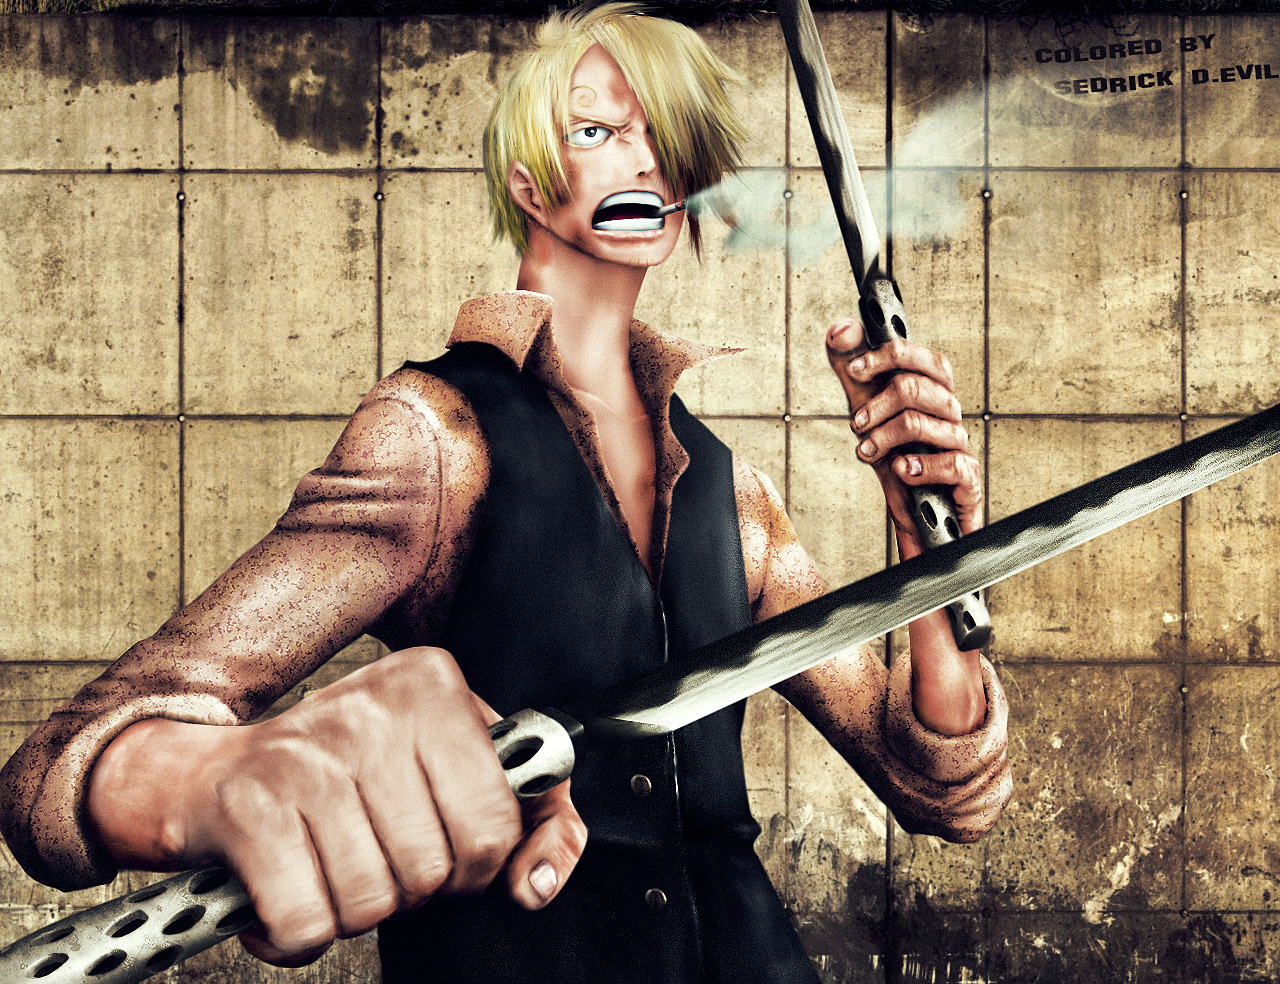 Sanji by Sedrick-D-Evil